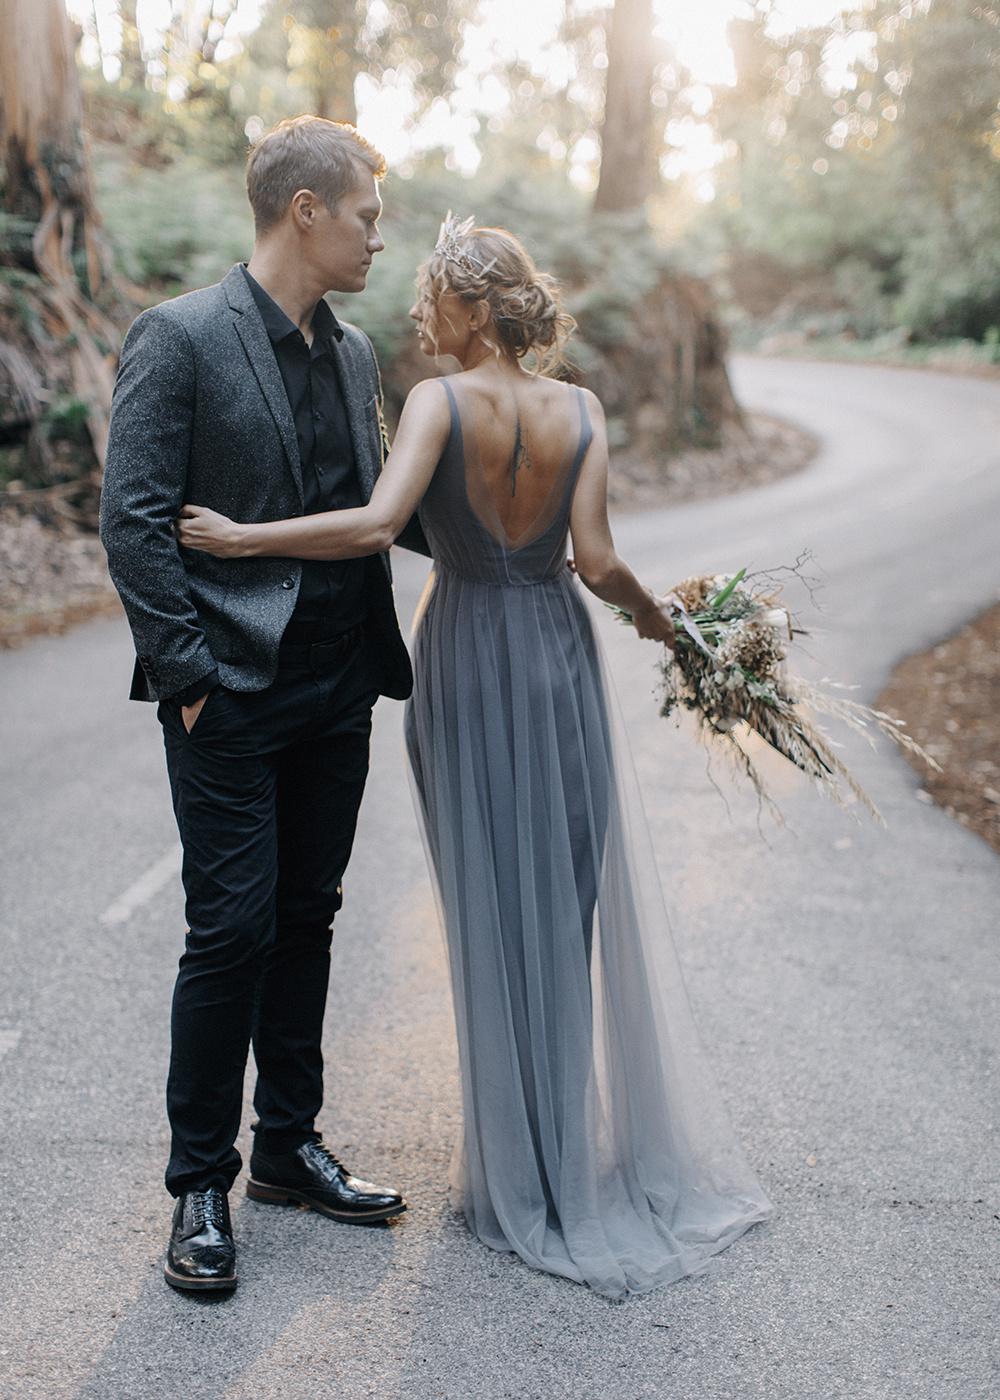 Portugal Story: свадьба для двоих в Португалии